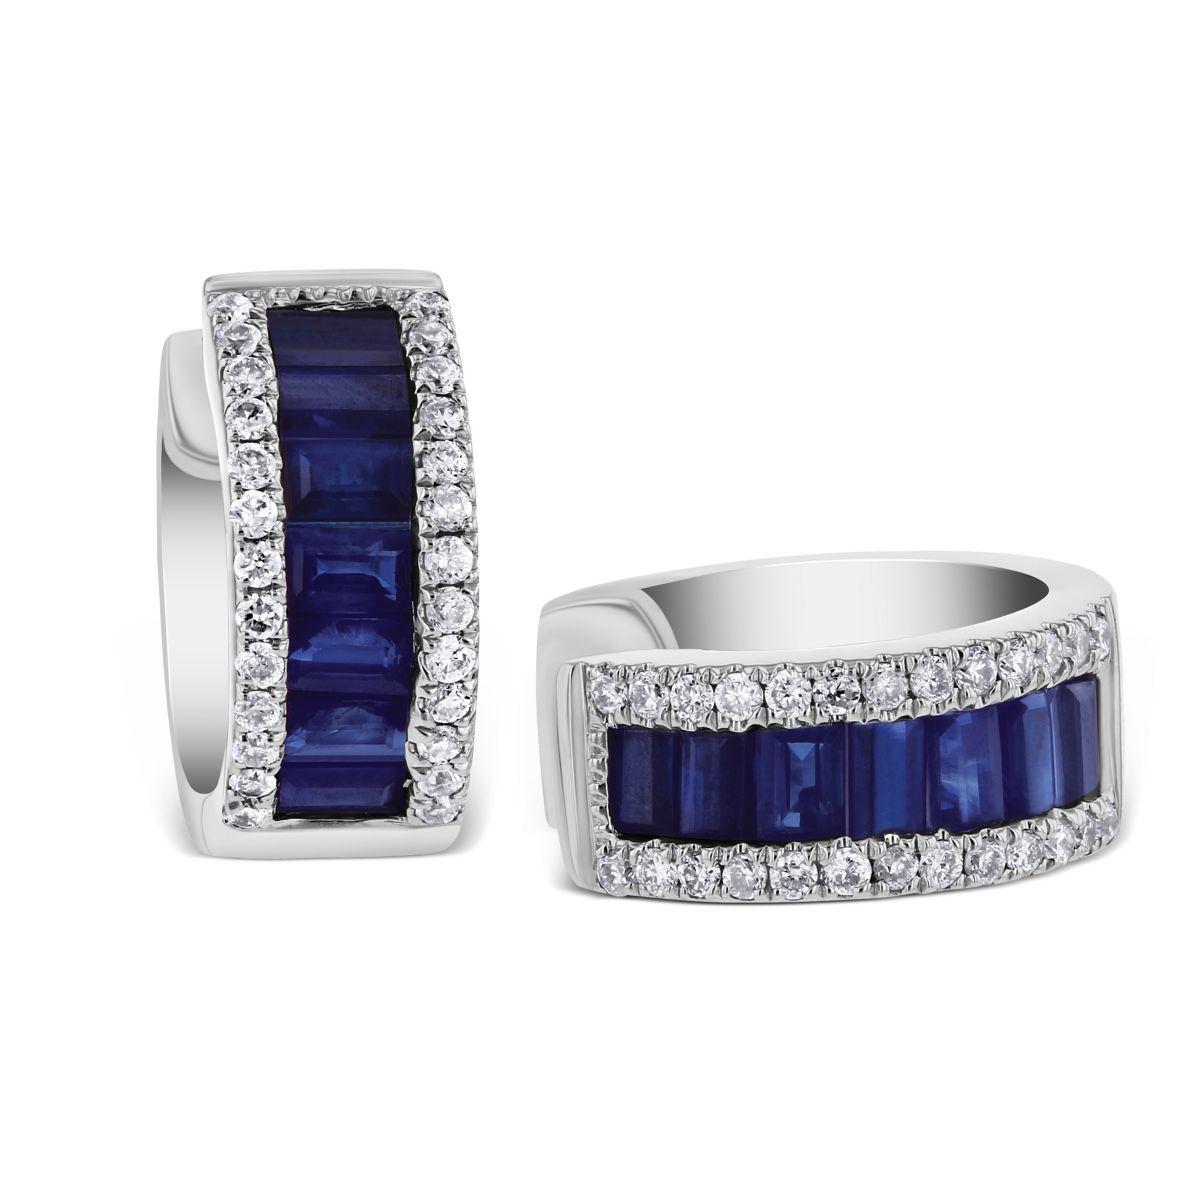 efe062429 14K White Gold Baguette Sapphire & Pave Diamond Petite Huggie Hoop ...